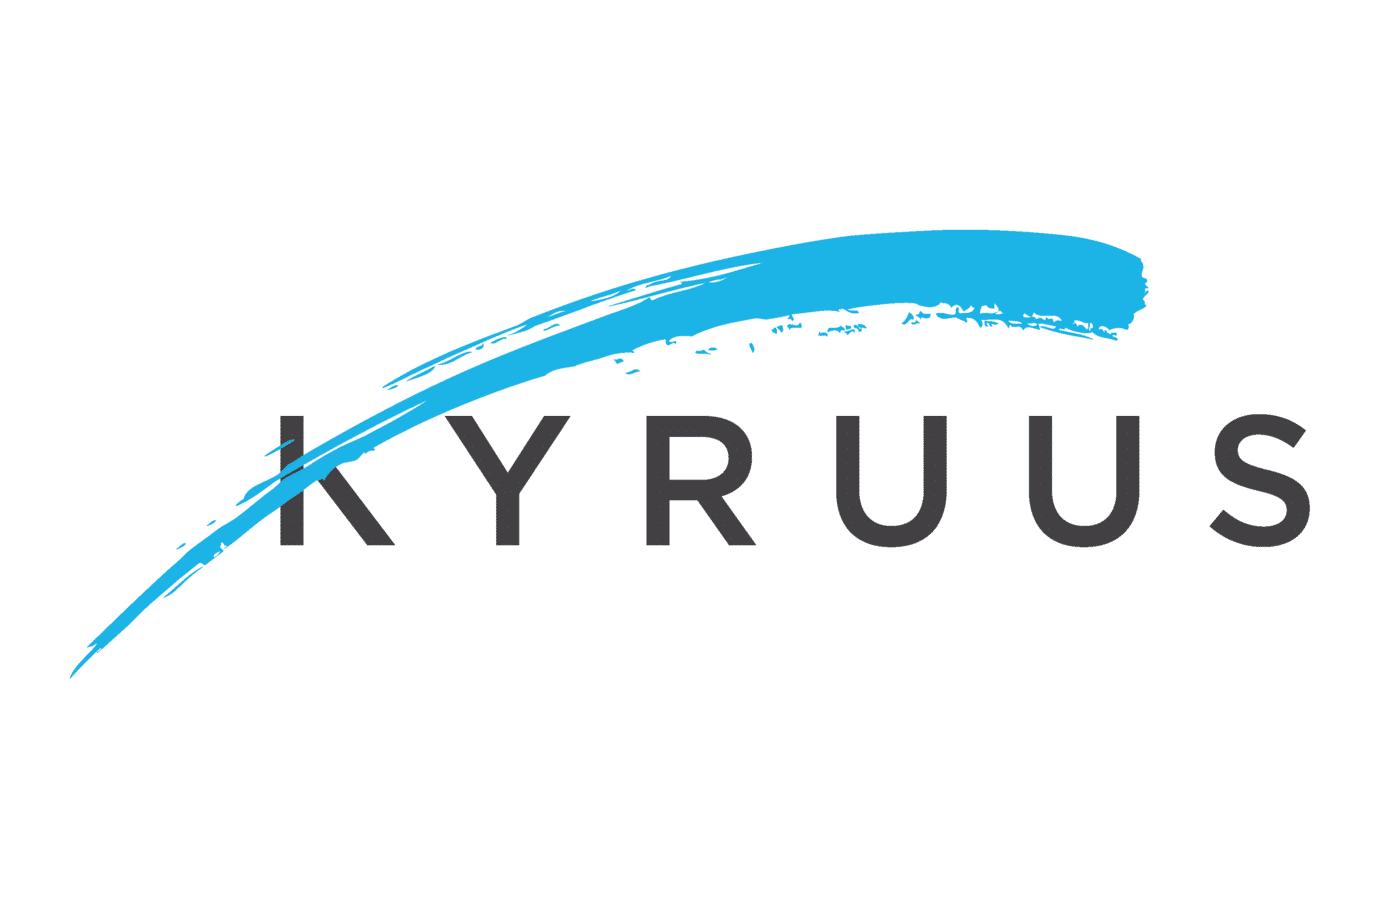 Kyruus_SolidColor.png-social